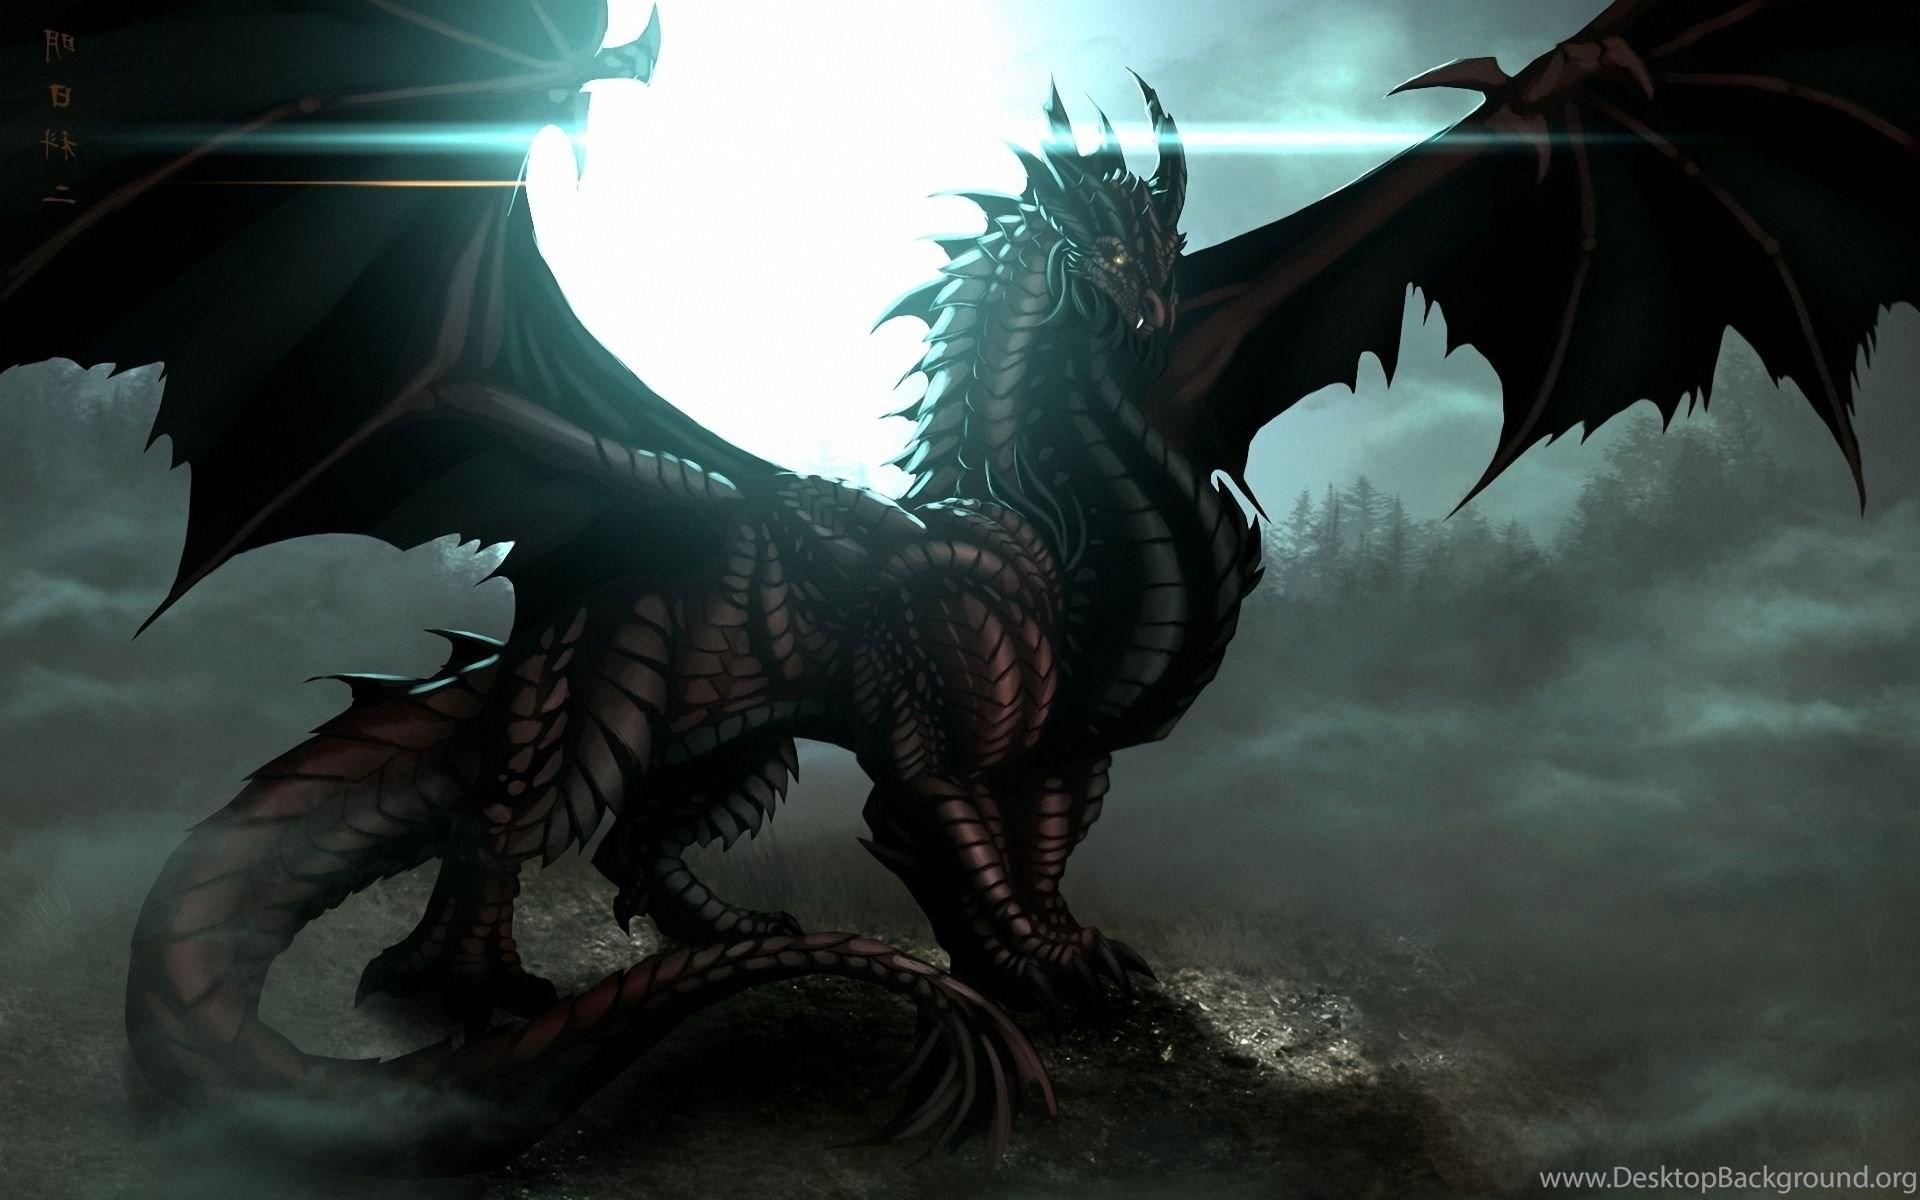 1920x1080px Creepy Dragon Wallpapers Hd Desktop Background